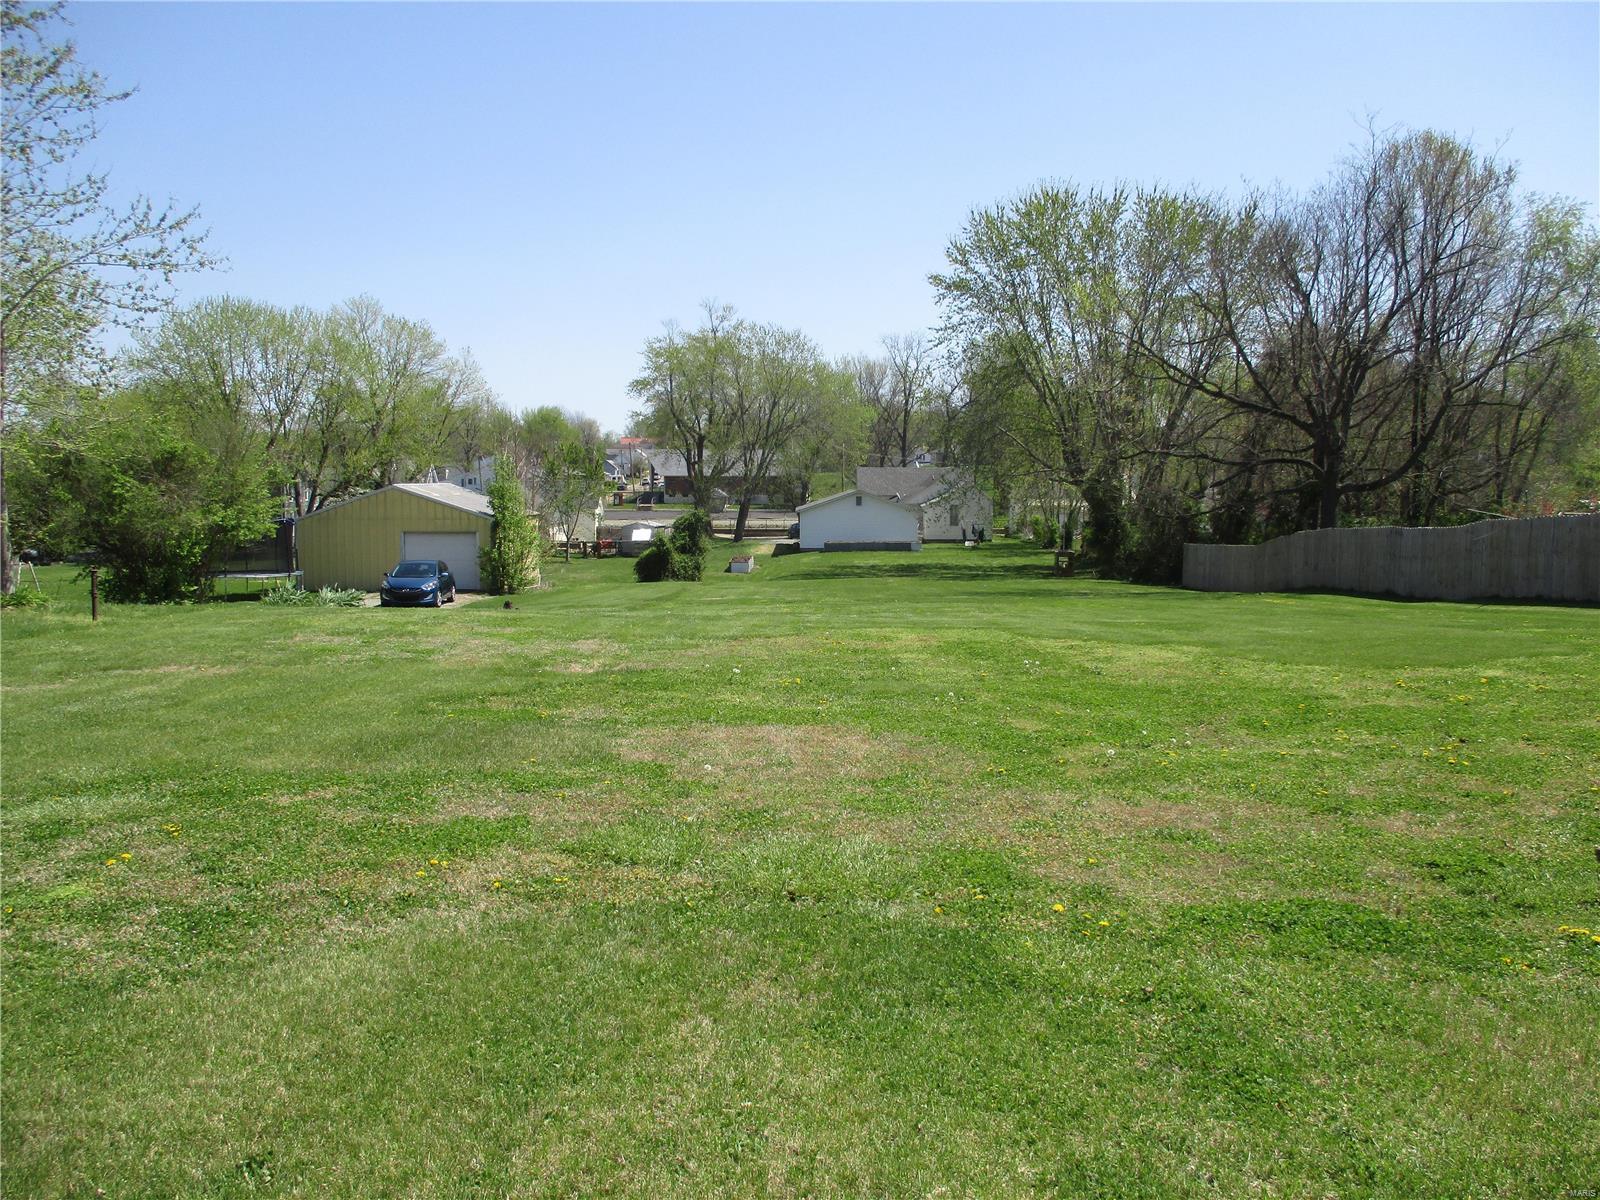 221 S. Main Property Photo